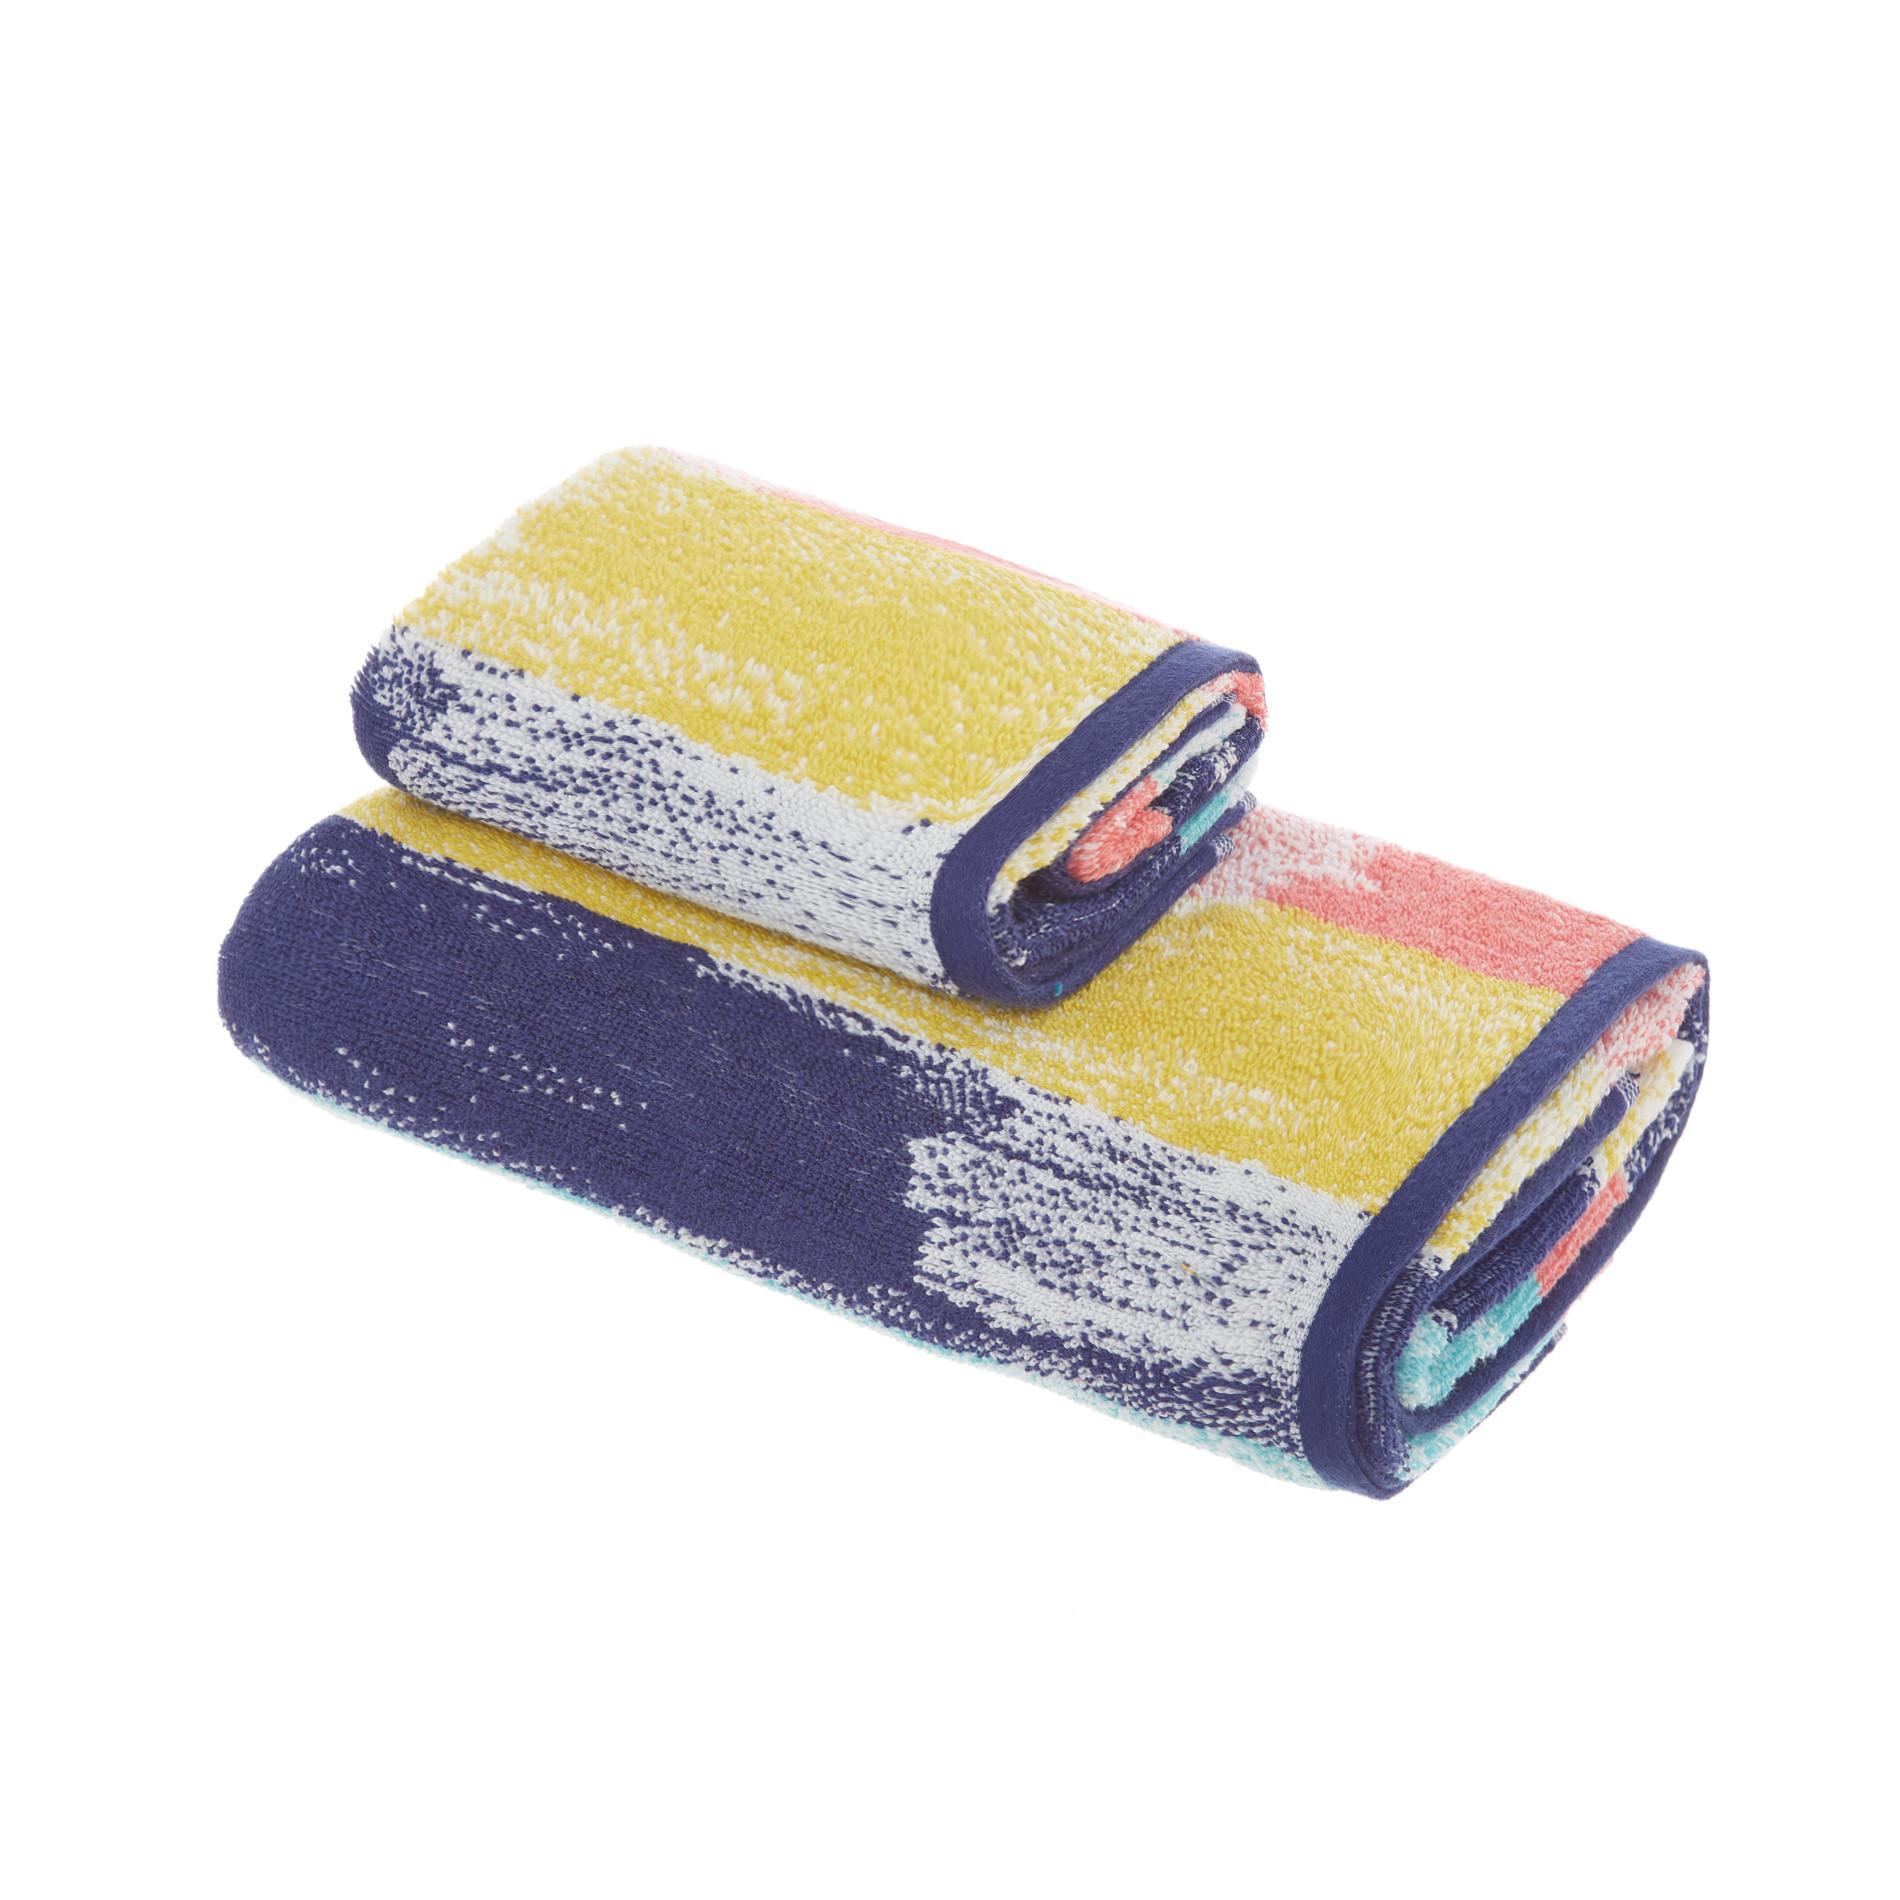 Asciugamano spugna di cotone fantasia pennellate, Multicolor, large image number 0